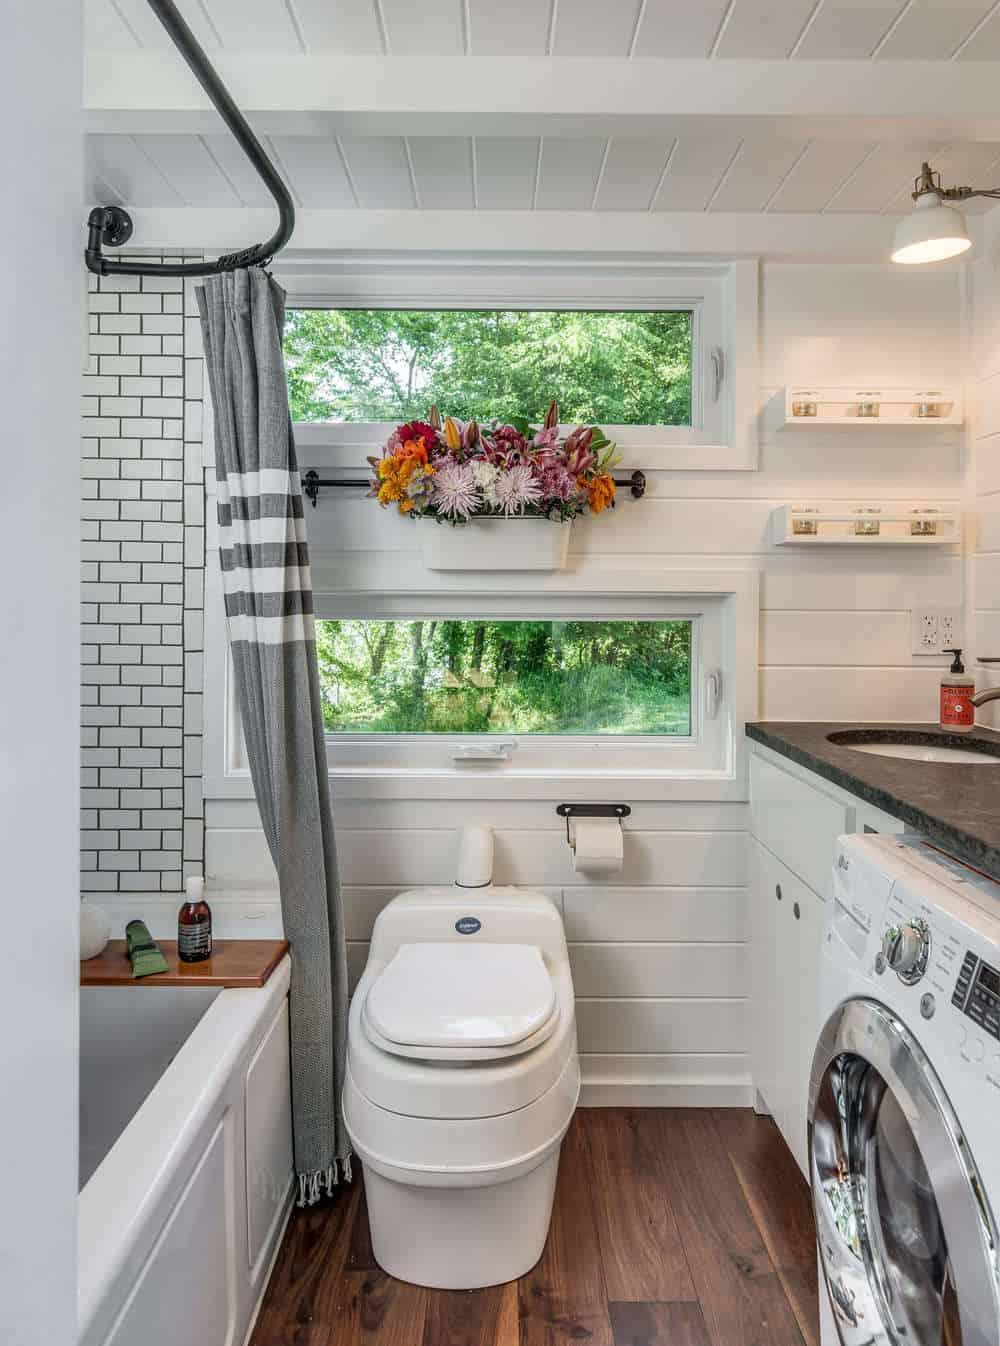 alpha-tiny-house-new-frontier-tiny-homes-29-1-kindesign